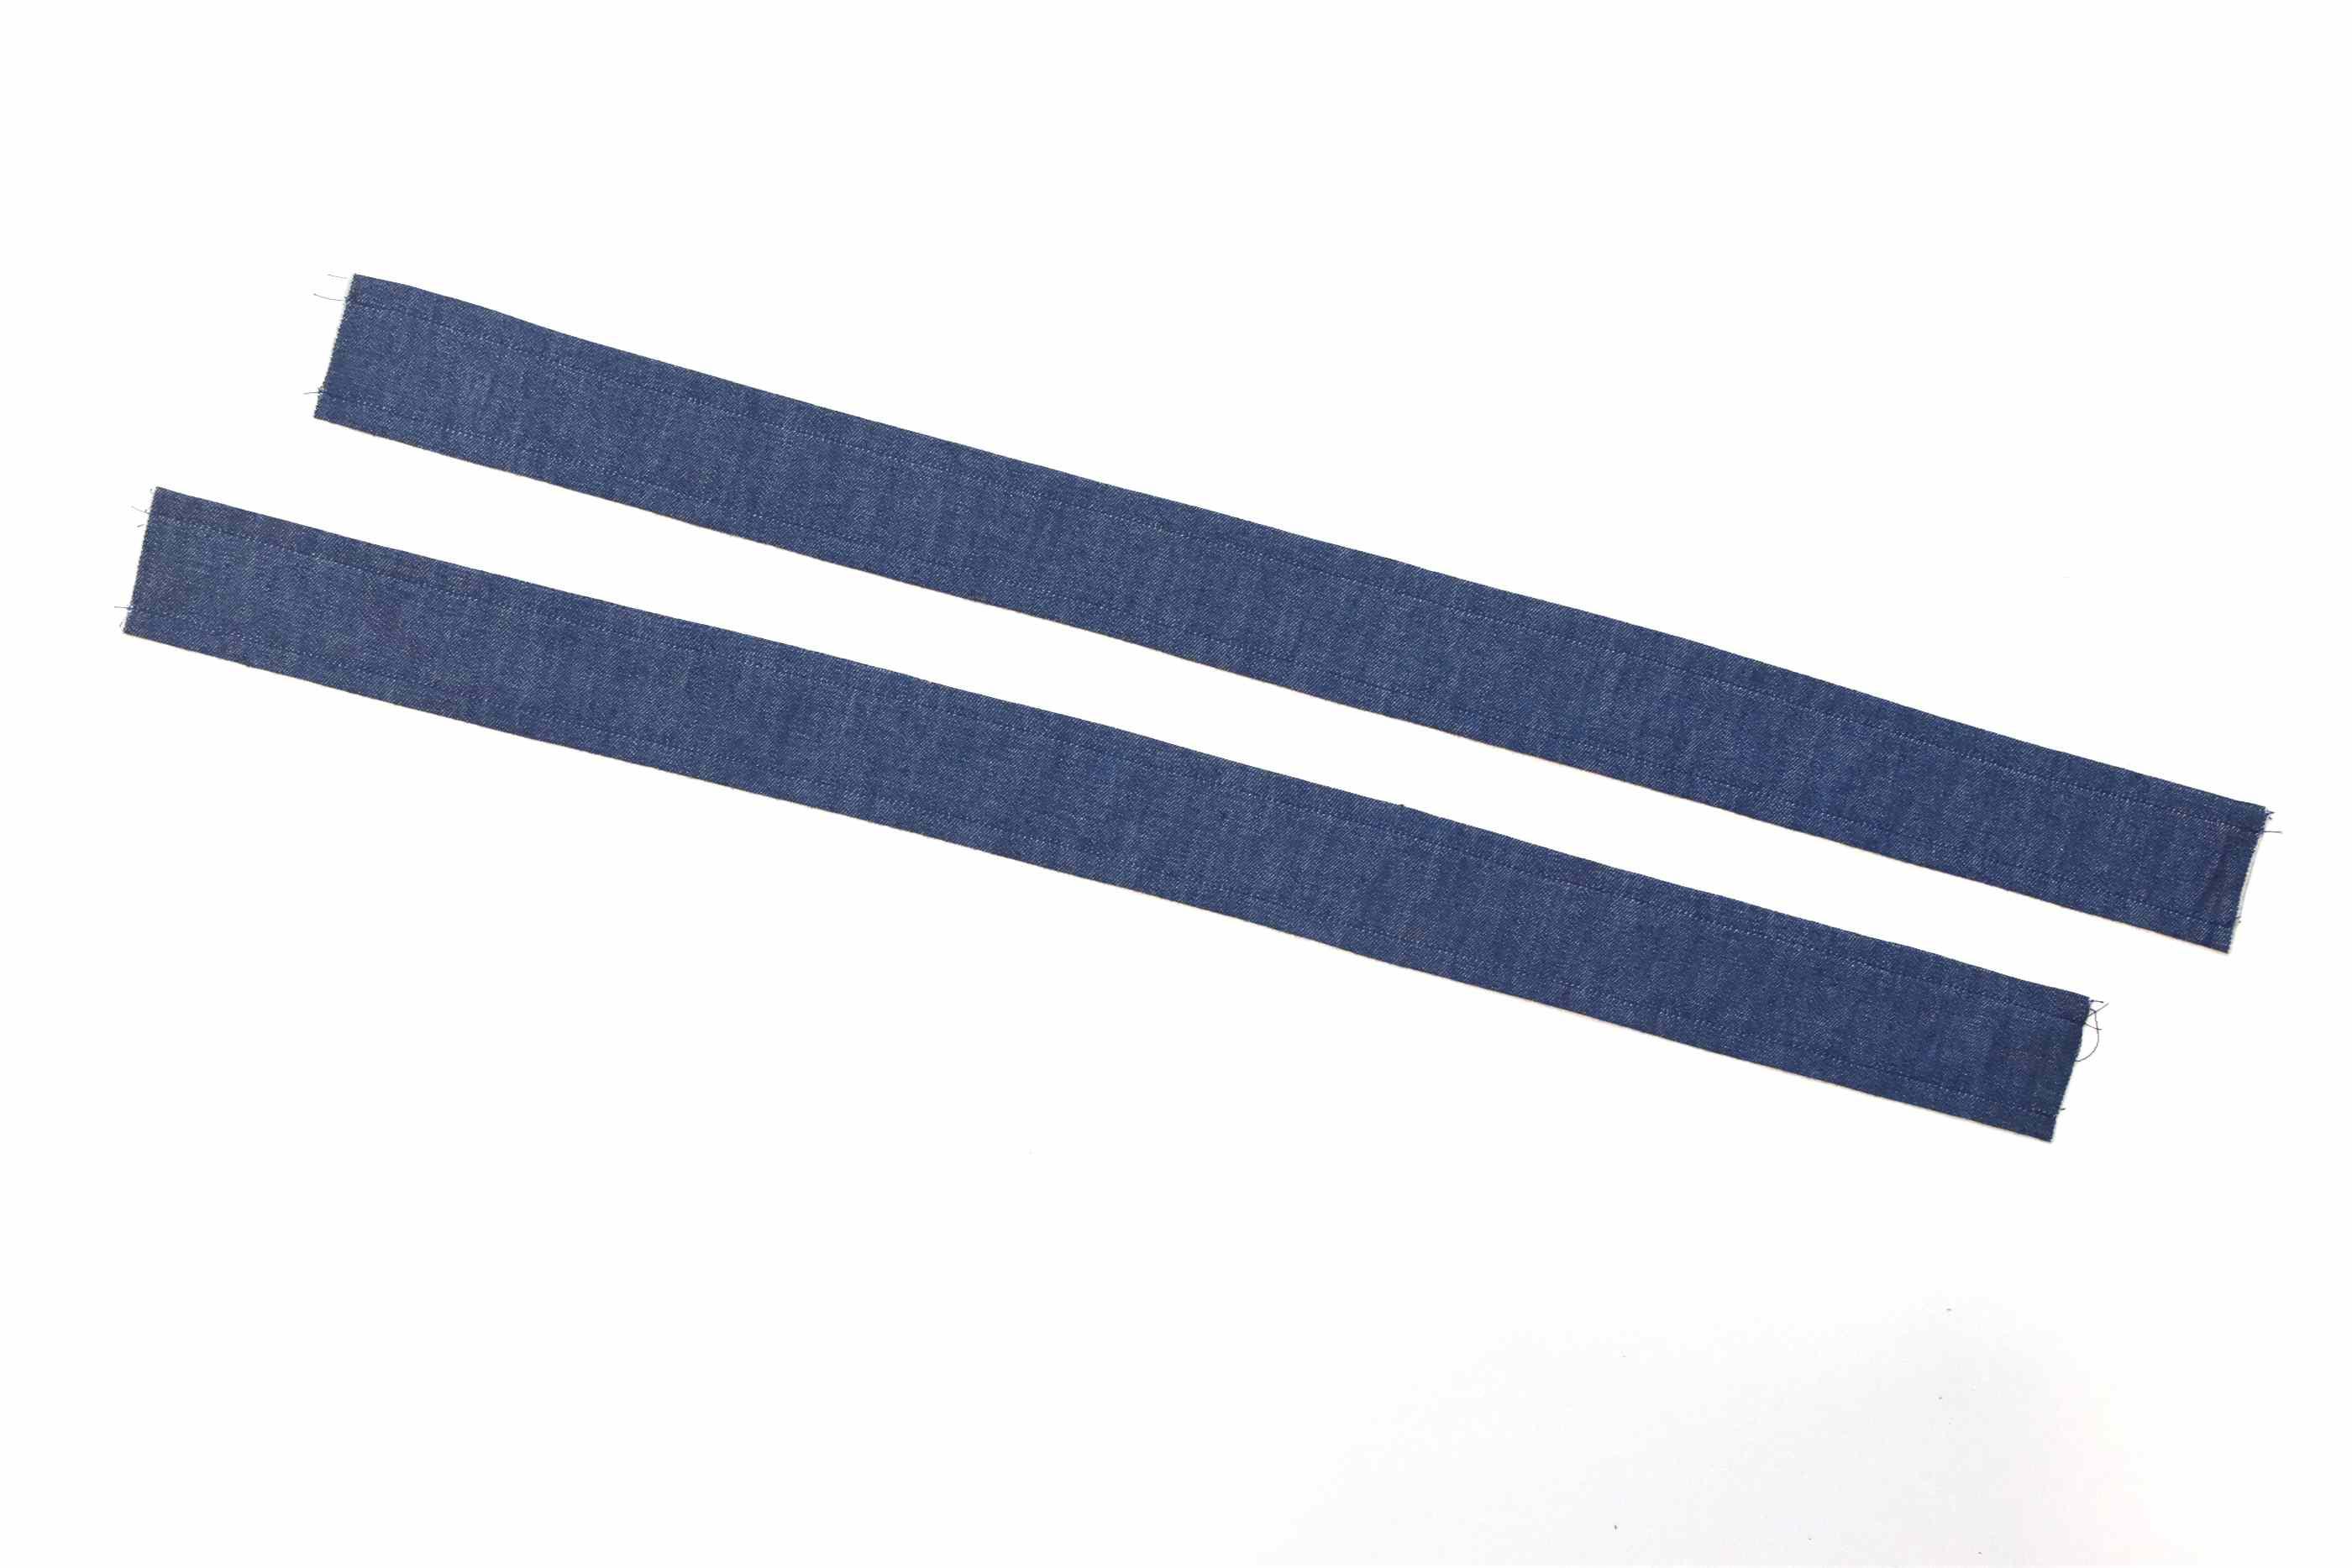 Sew the Apron Straps